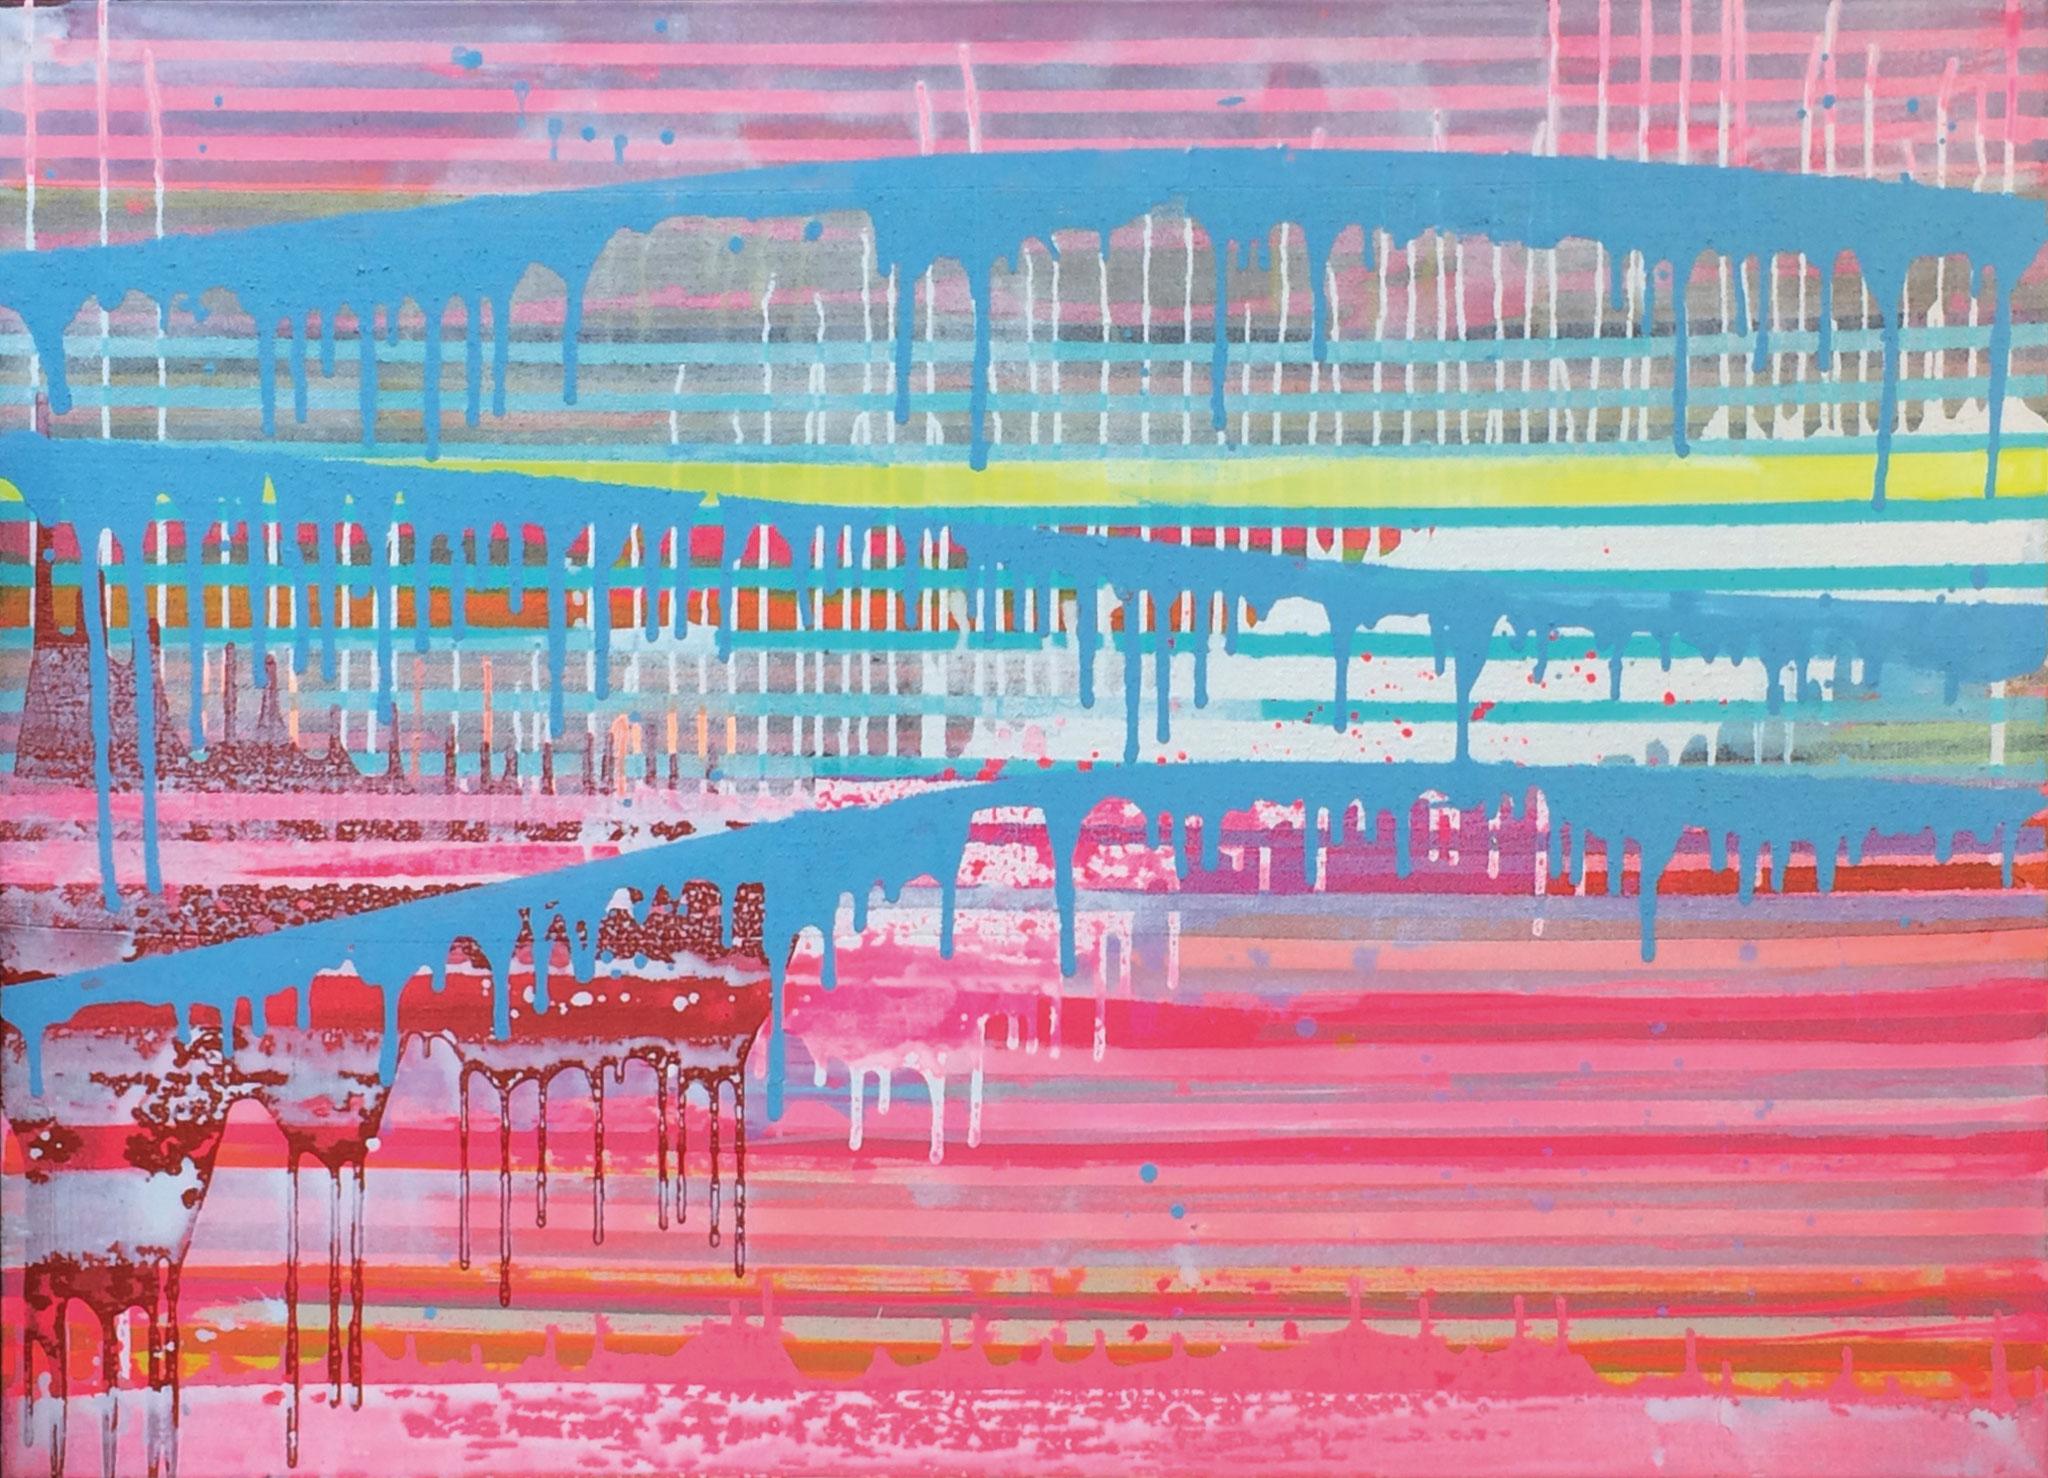 Stripes XIX   140x100cm 2014 Pigmente / Binder auf Leinwand